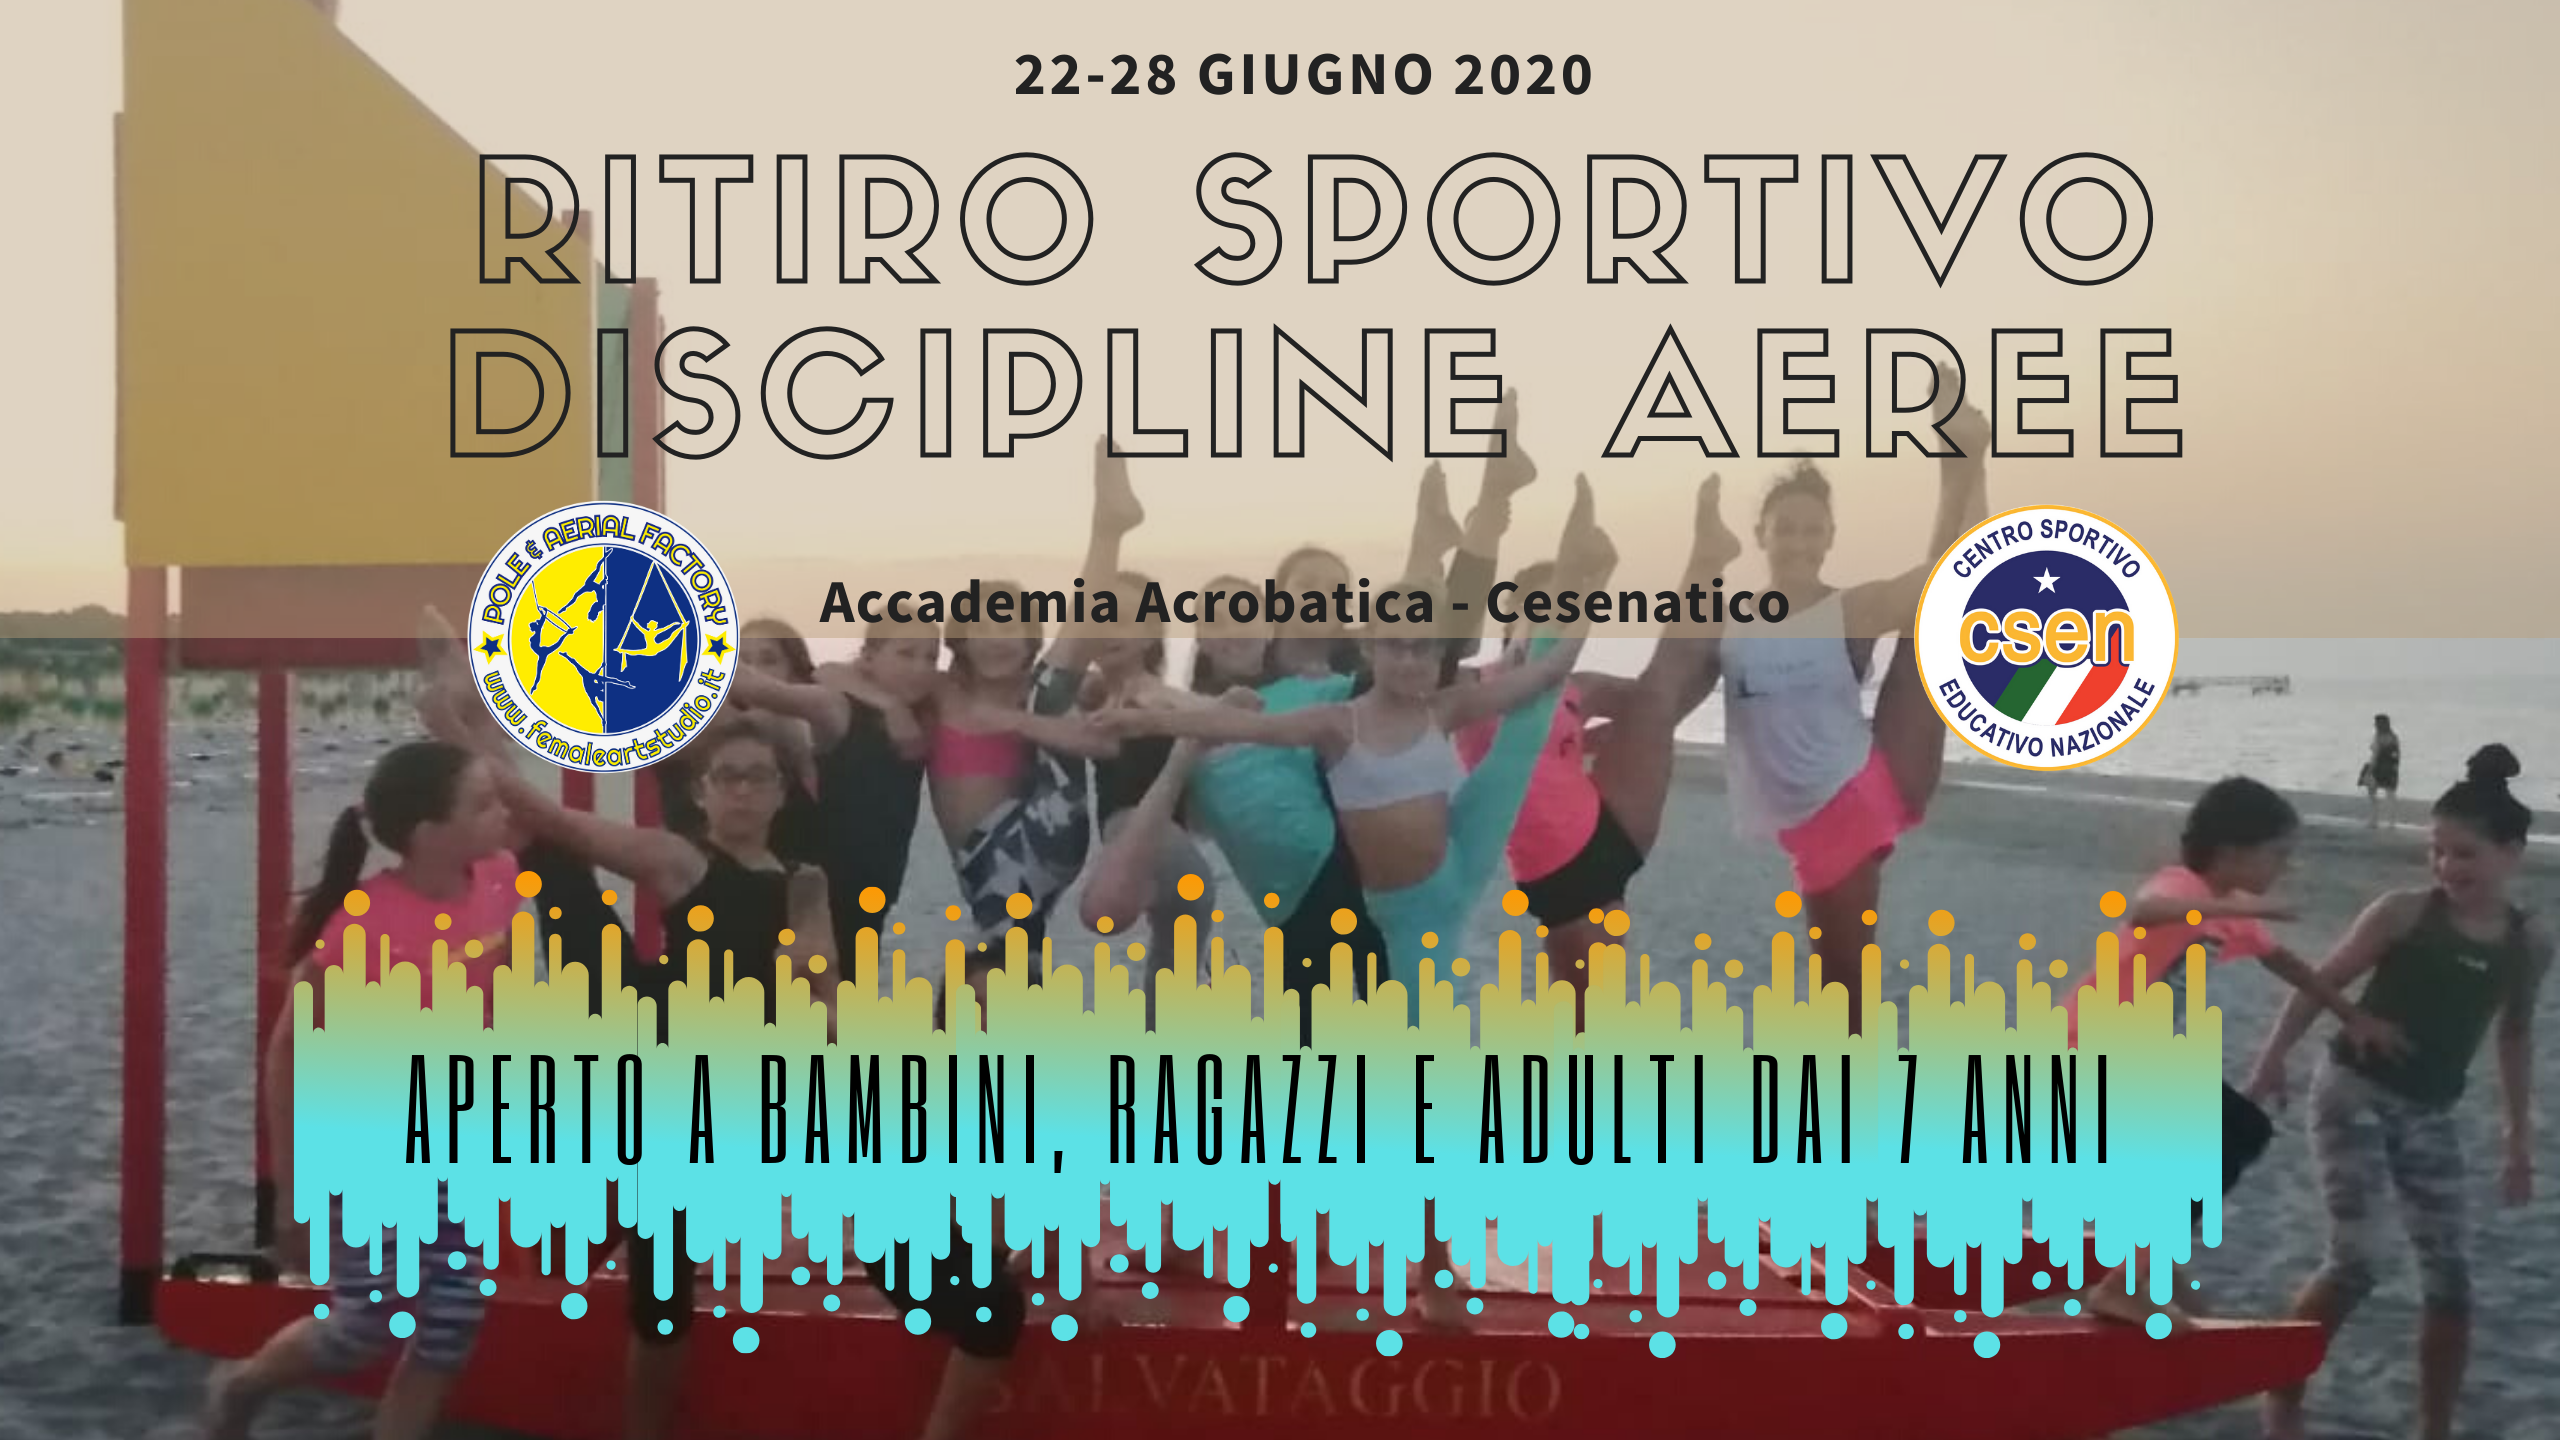 Ritiro Sportivo Discipline Aeree